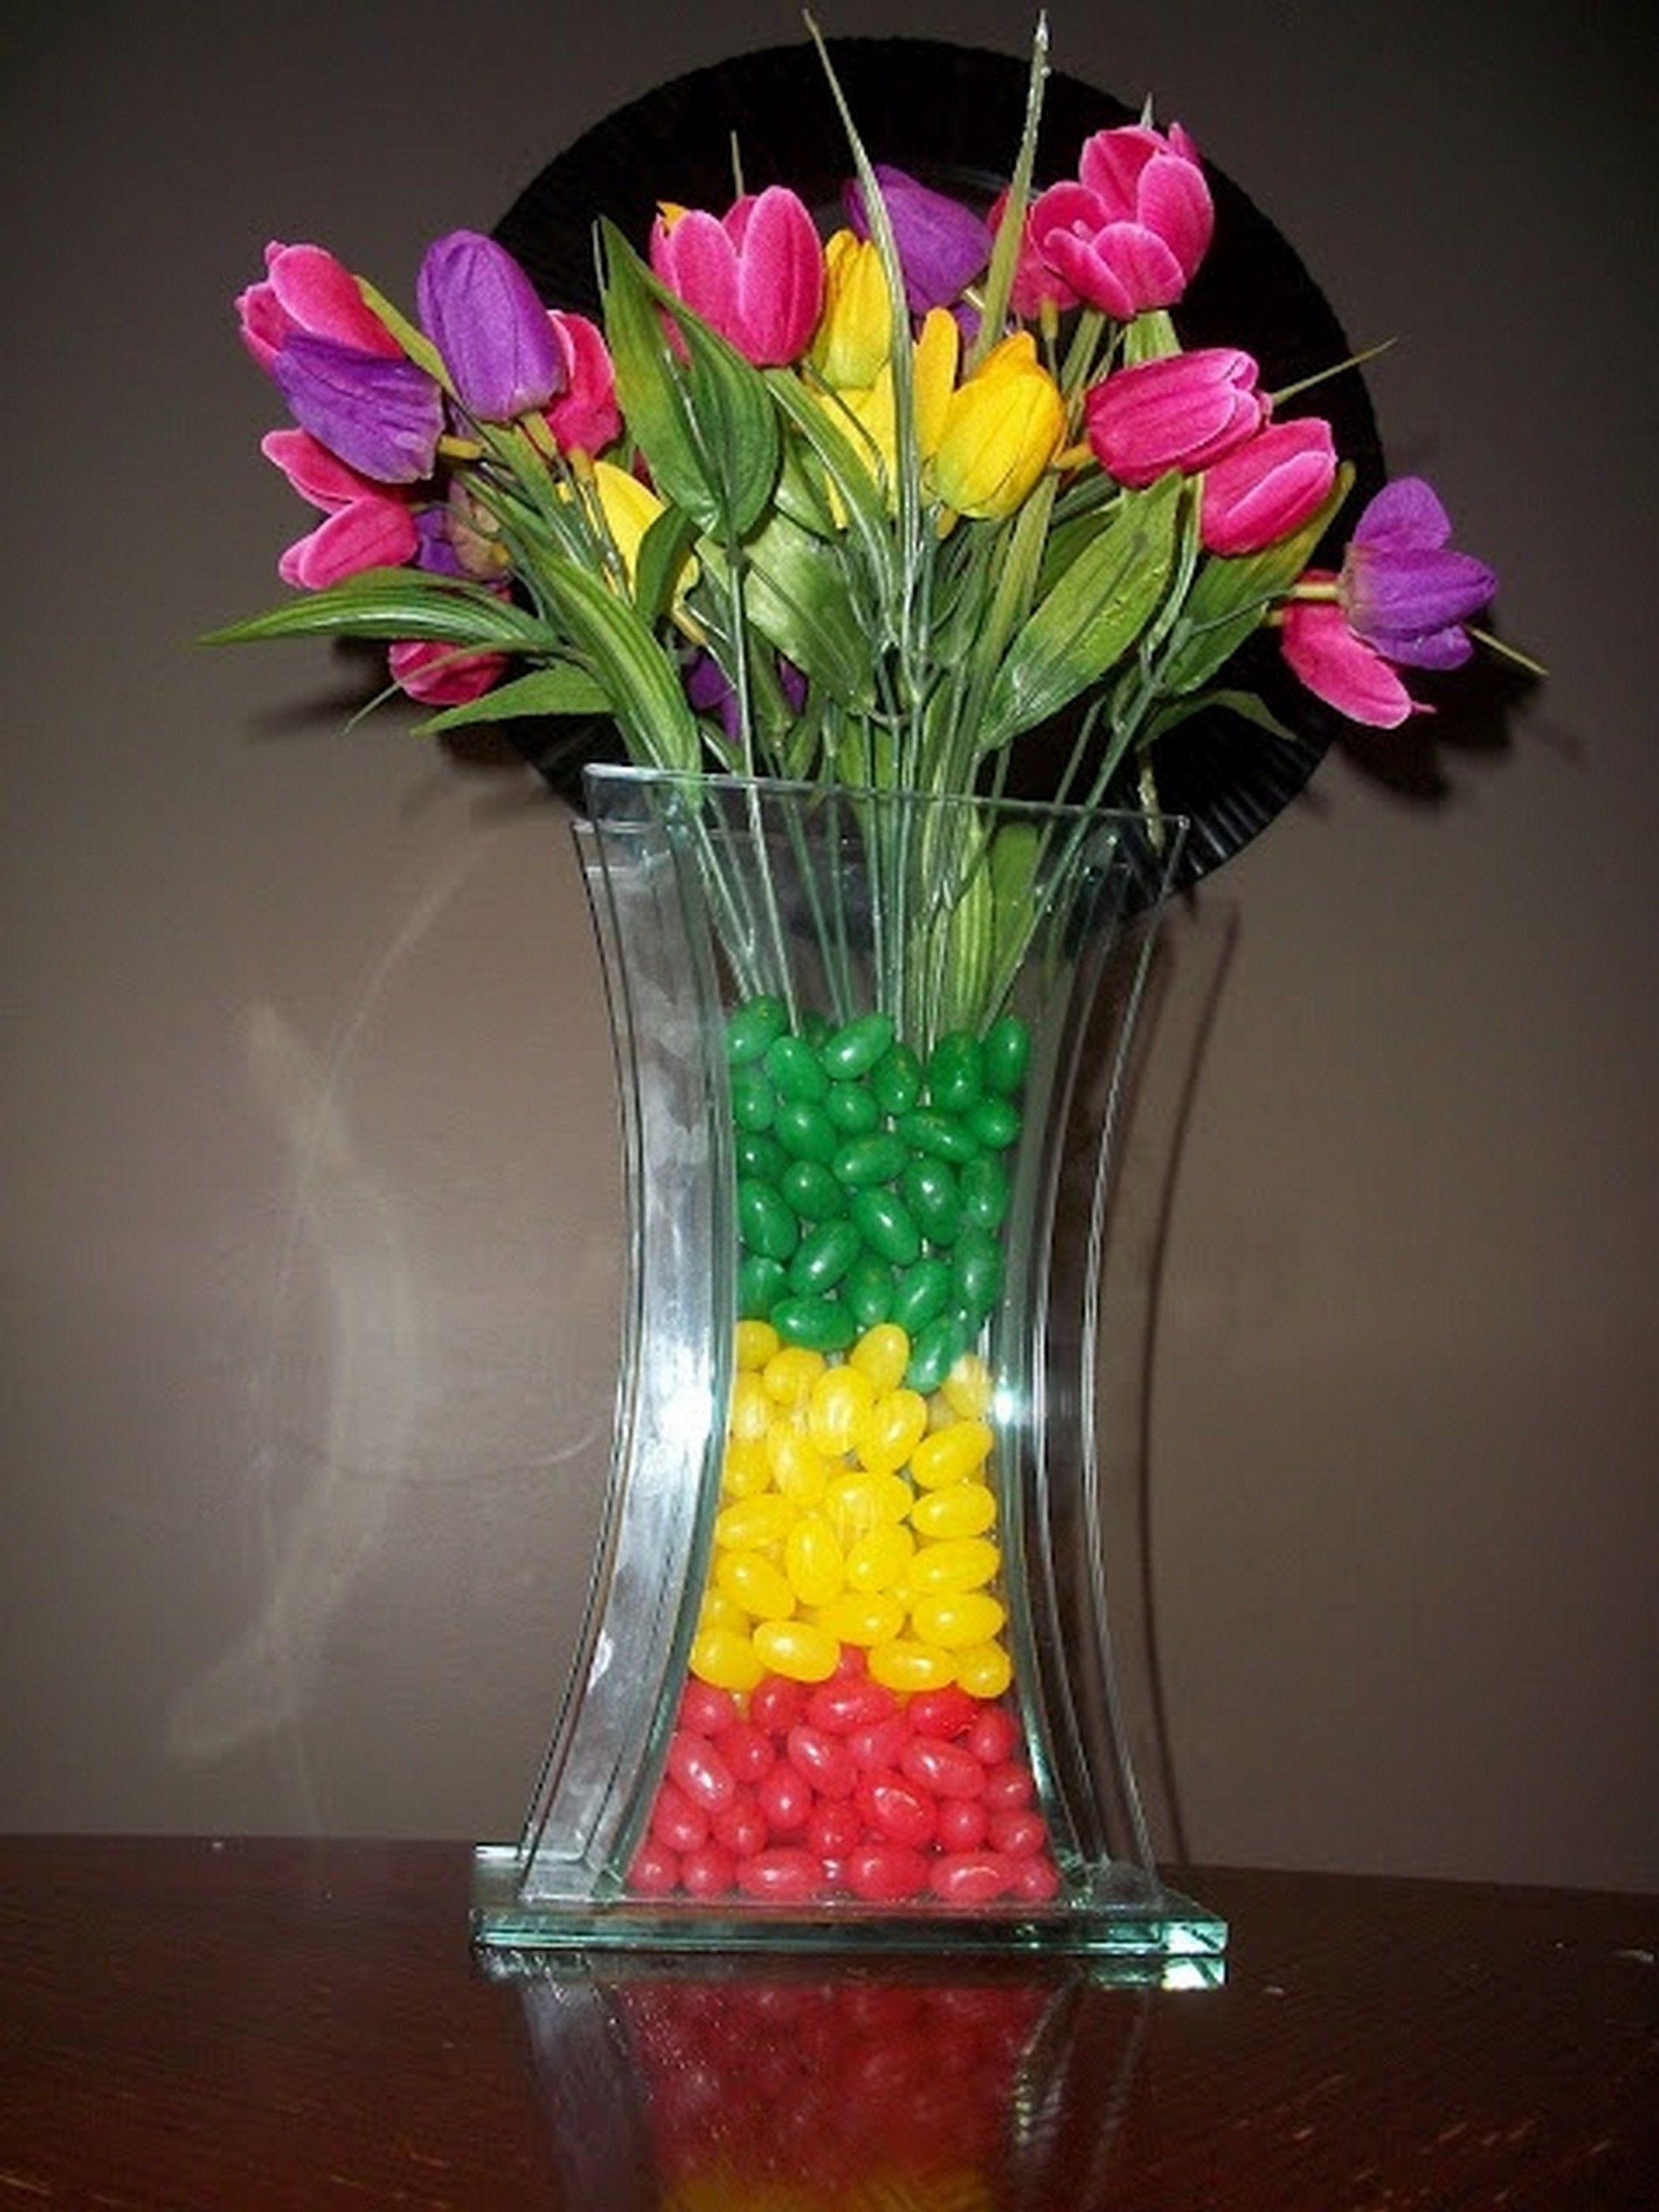 flower vase stand of 50 tall vase fillers the weekly world regarding 15 cheap and easy diy vase filler ideas 3h vases flower i 0d scheme